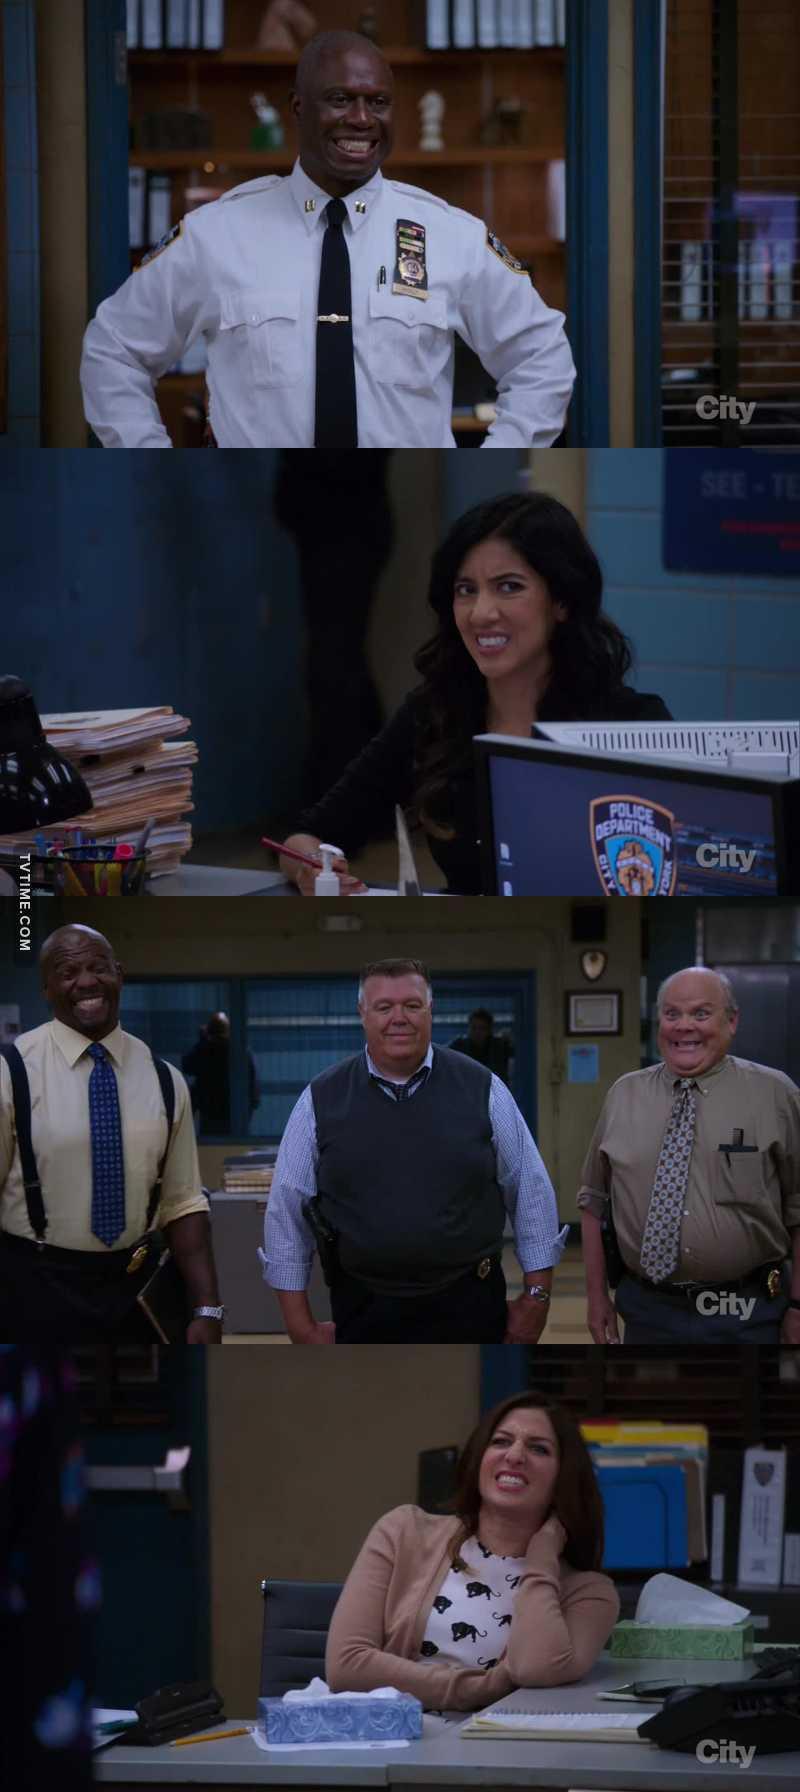 the best scene 😂😂